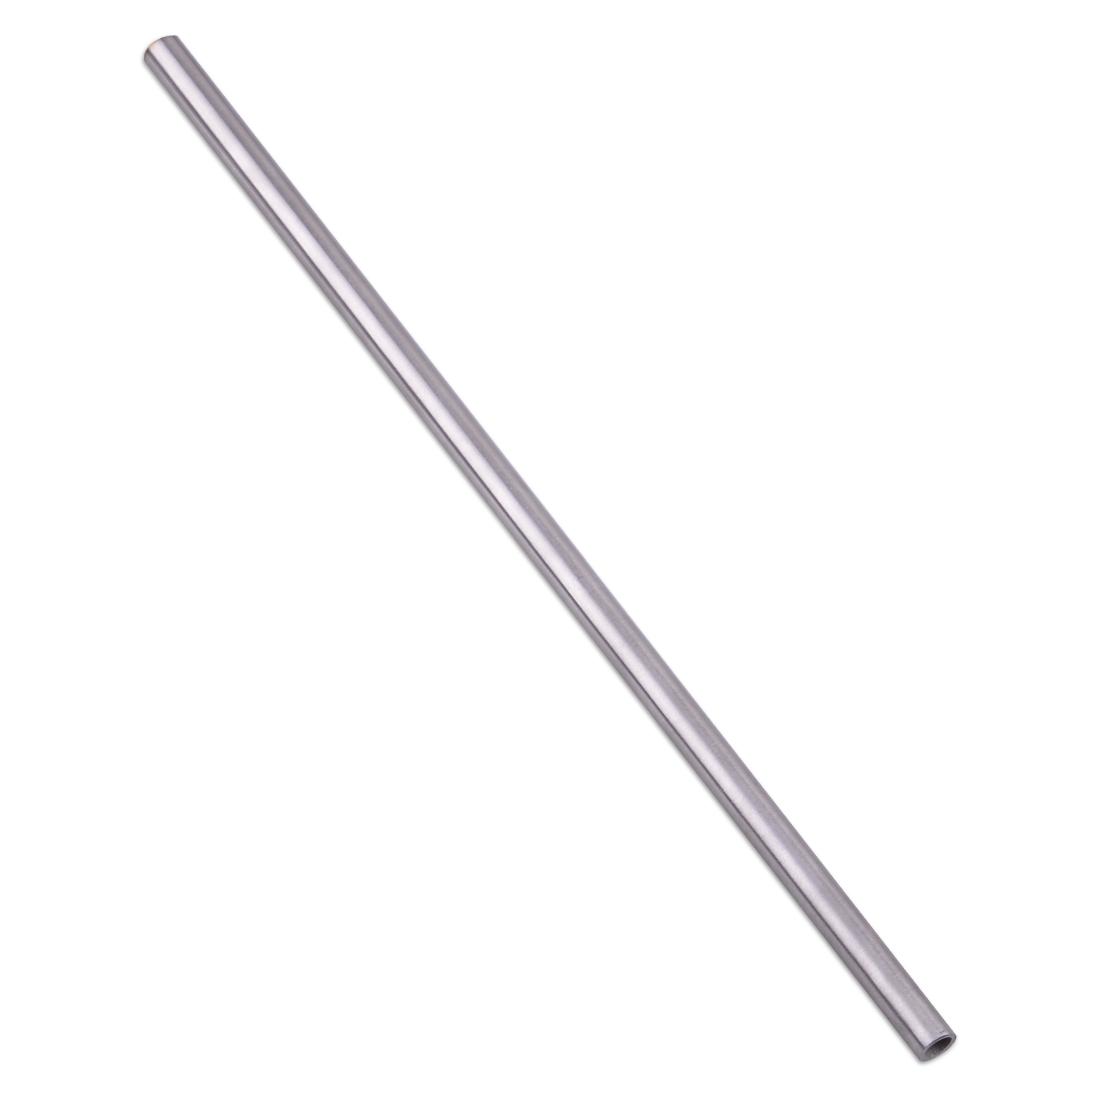 250mm Length Od 8mmx6mm Id 304 Stainless Steel Capillary